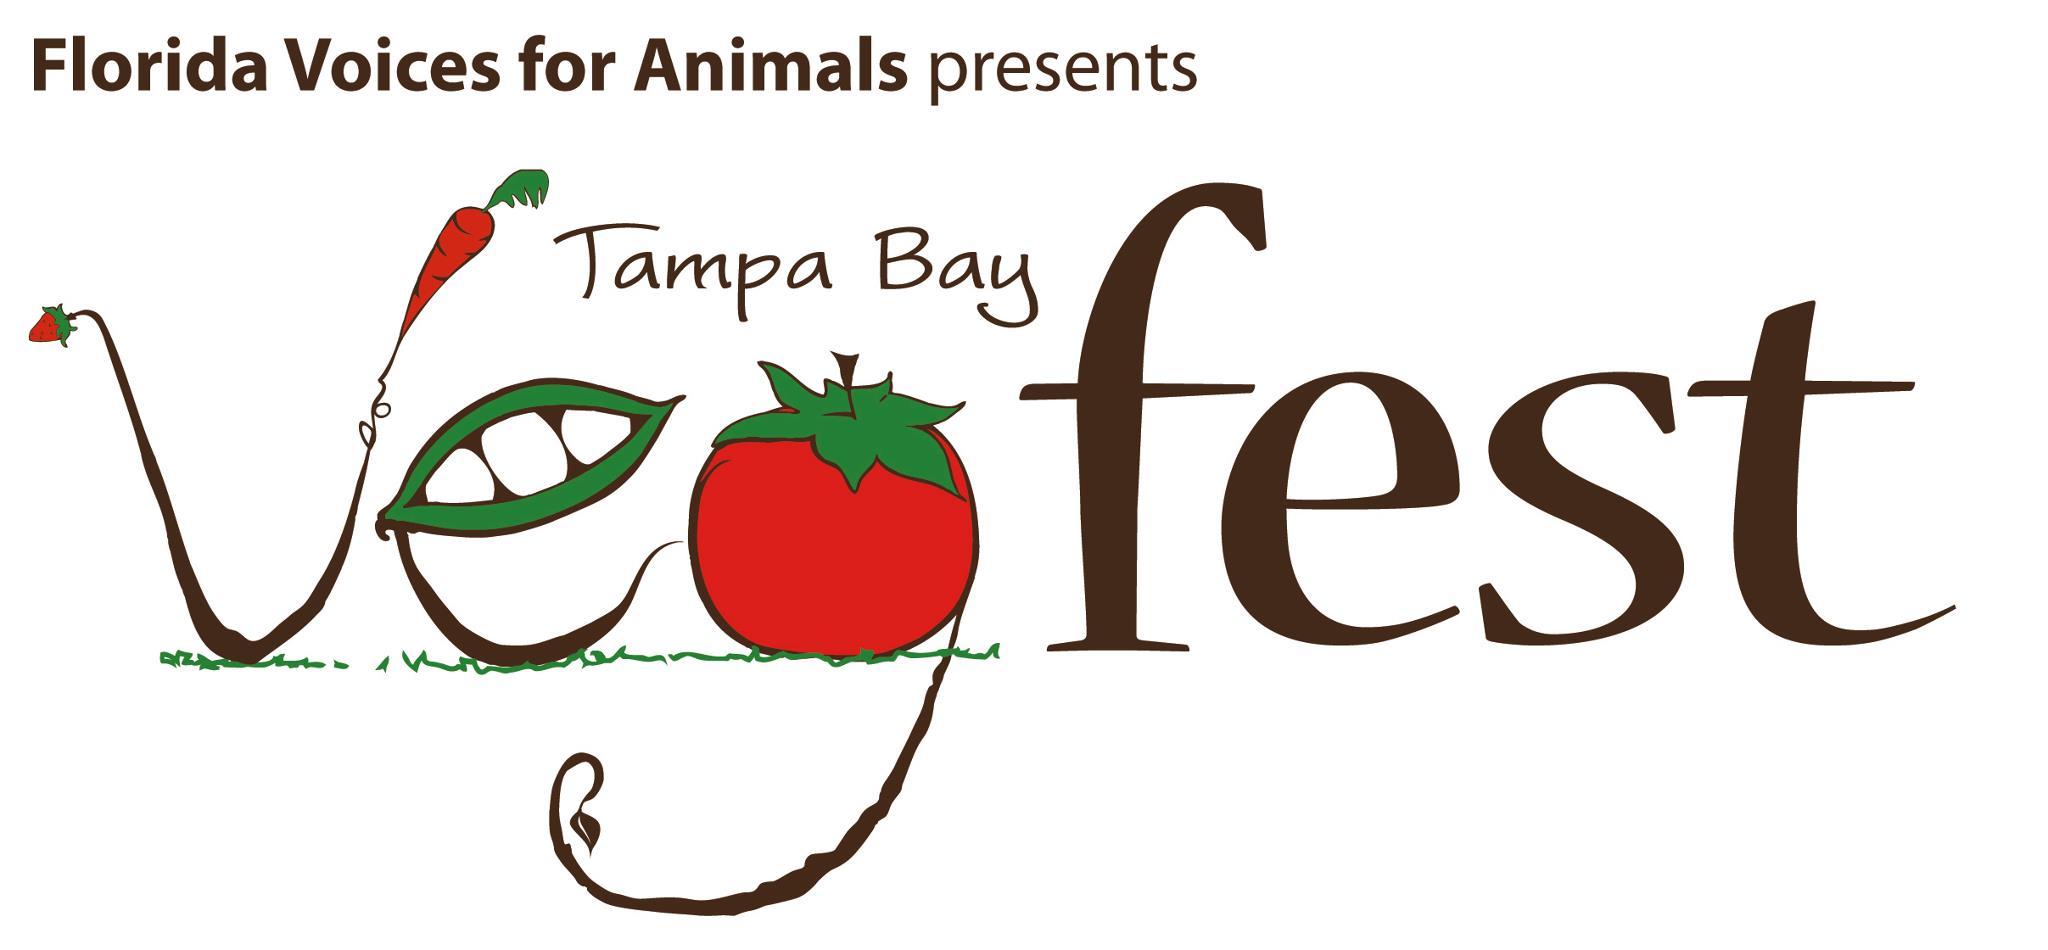 Tampa Bay Veg Fest 2017